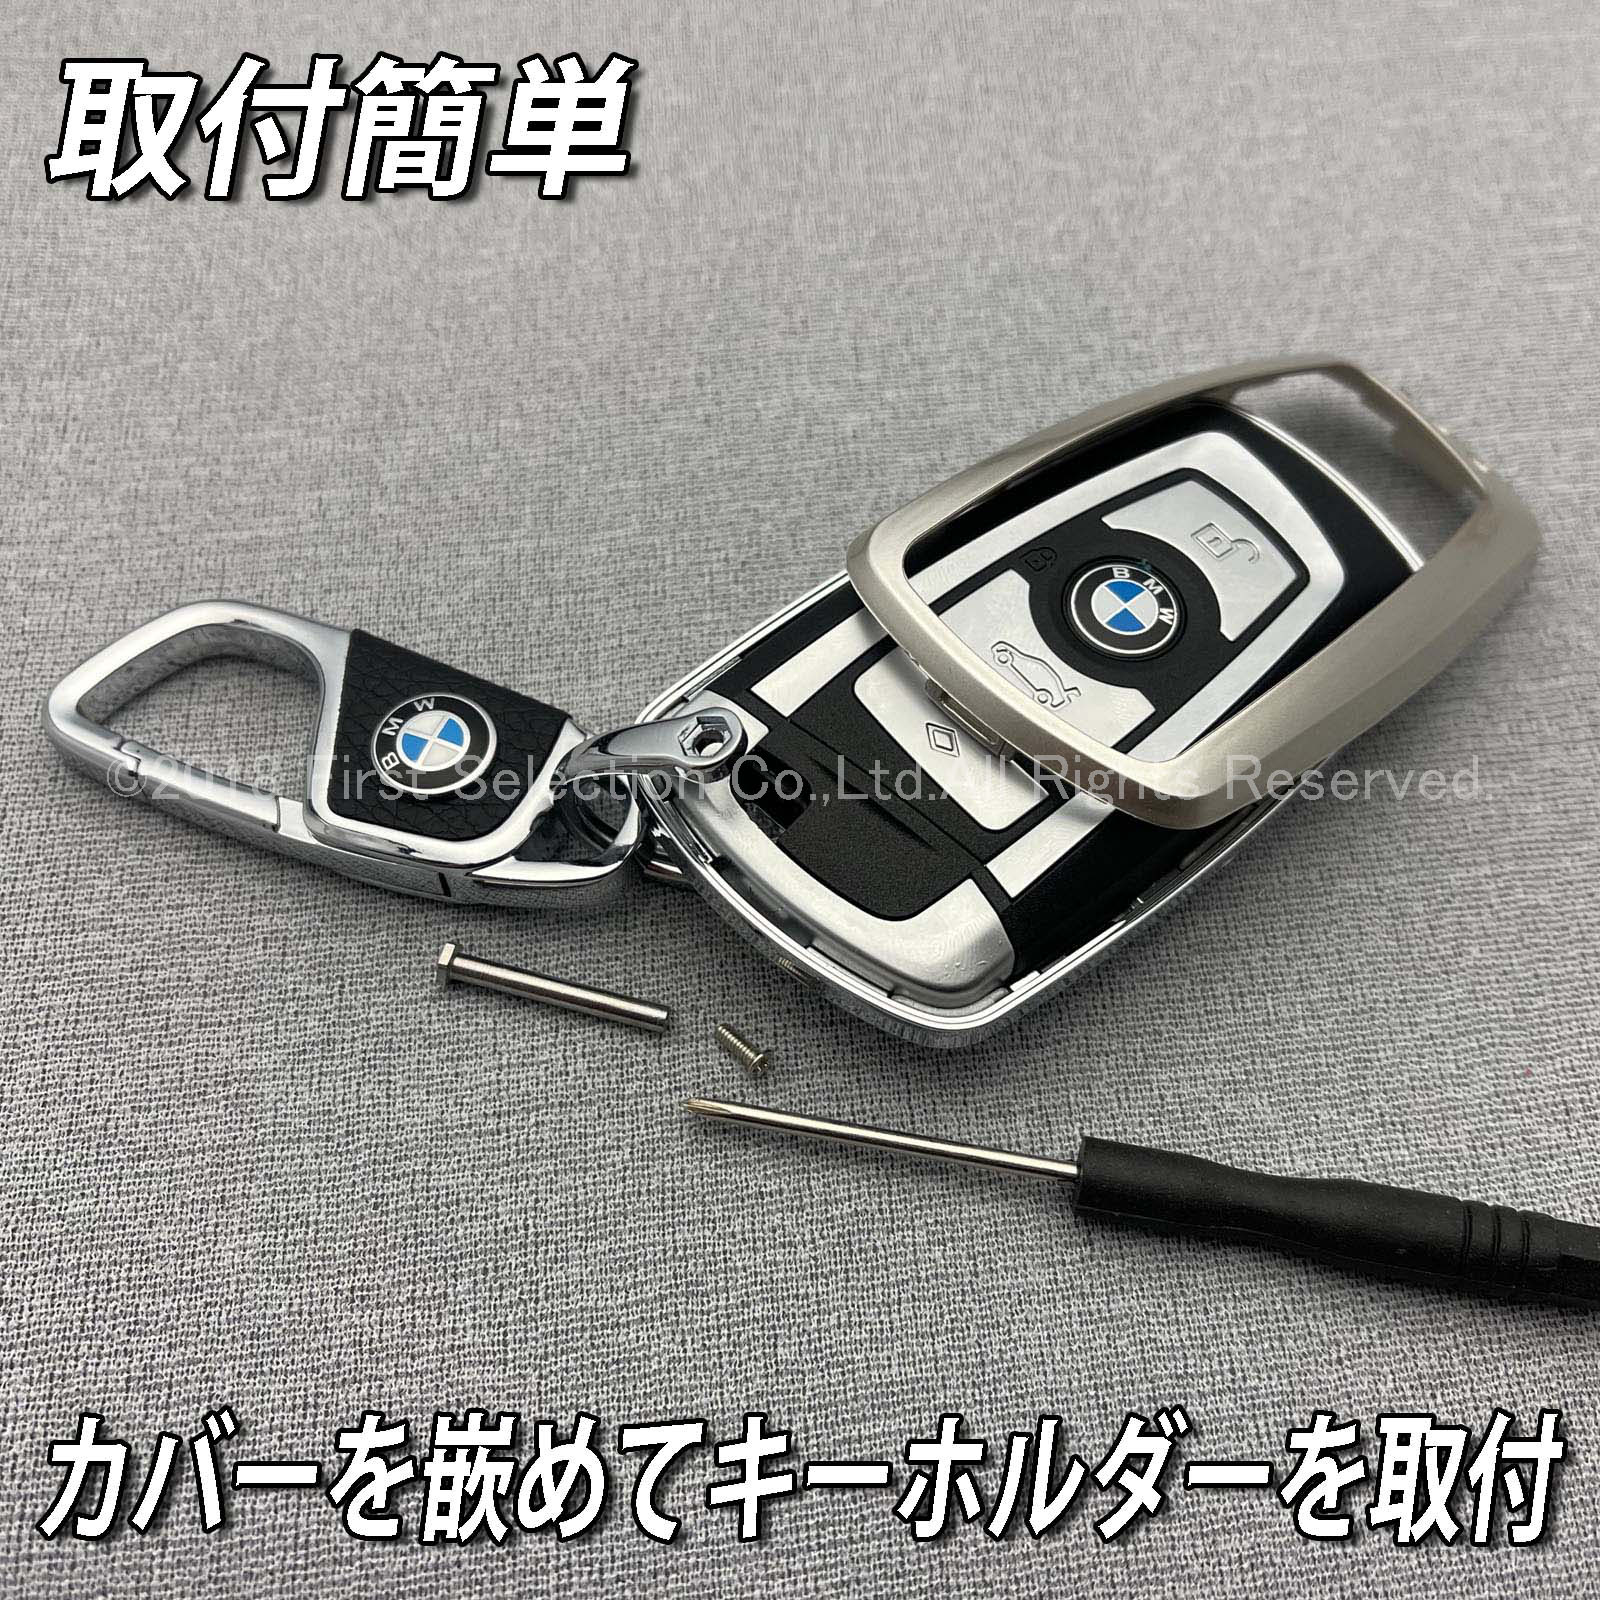 BMW F系スマートキー用 高級キーケースセット艶C金 F20 F22 F23 F30 F31 F34 F32 F33 F36 F10 F11 F07 F12 F13 F06 F01 F25 F26 F80 F82 F83